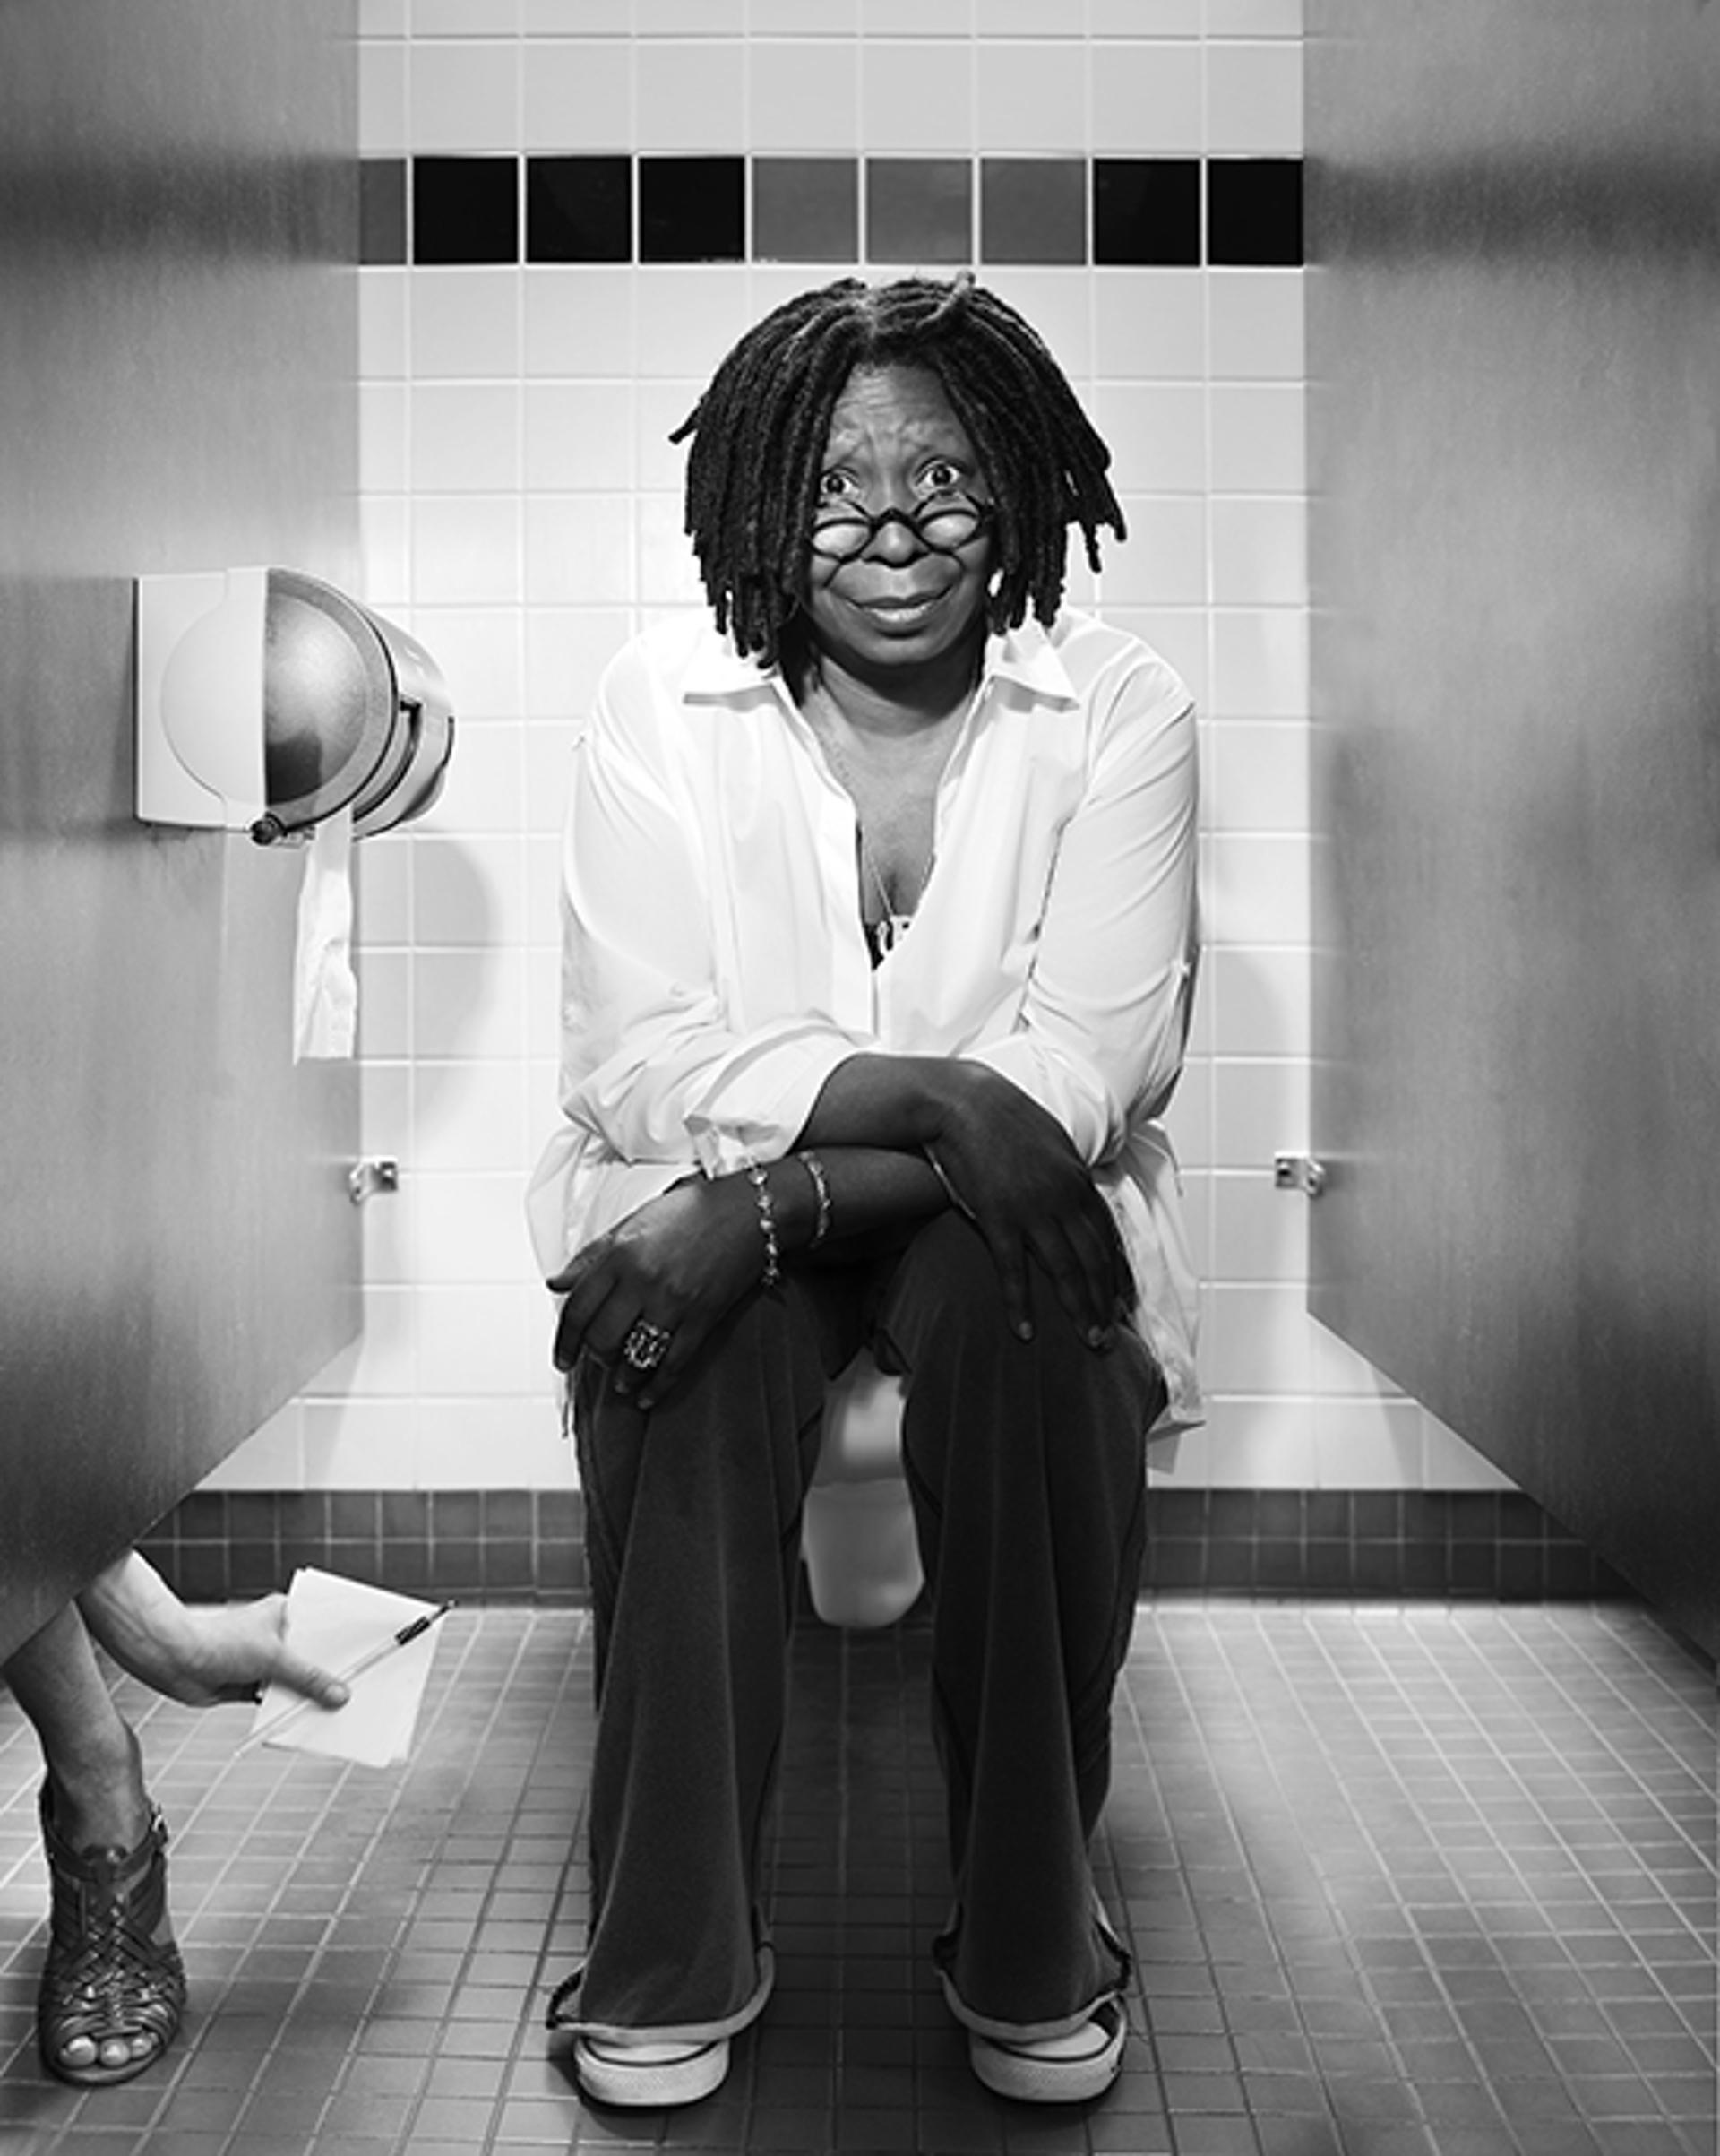 10009 Whoopi Goldberg Toilet 2010 BW by Timothy White